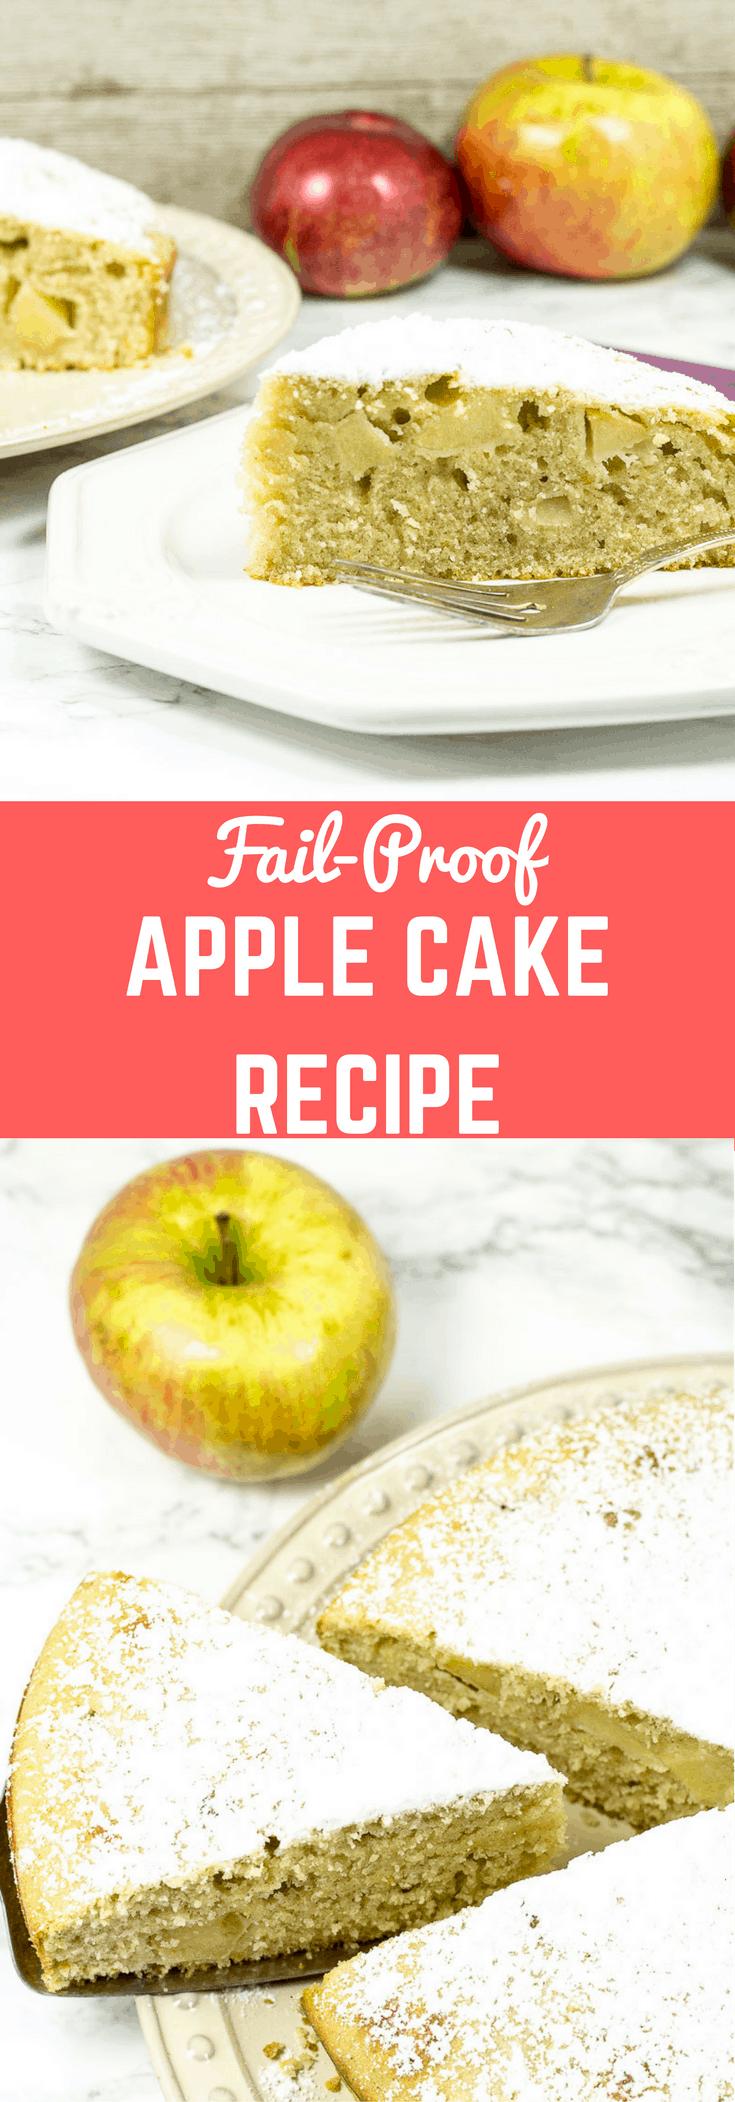 Apples Recipes Cake Apple Fresh Easy Mix Cake